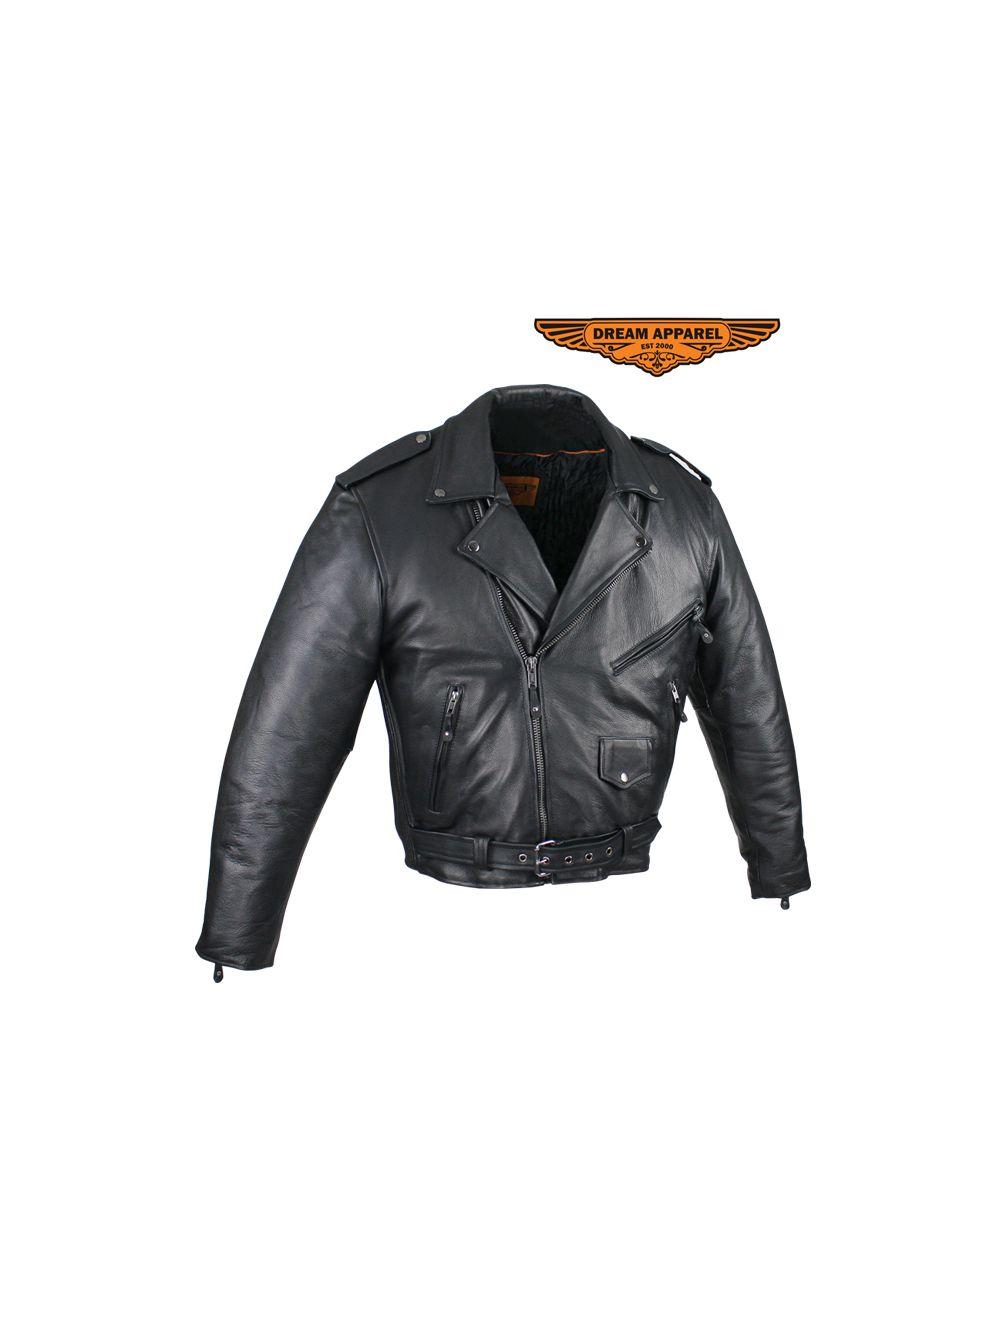 Naked Cowhide Leather Studded Thigh Bag W/ Gun Pocket - Black